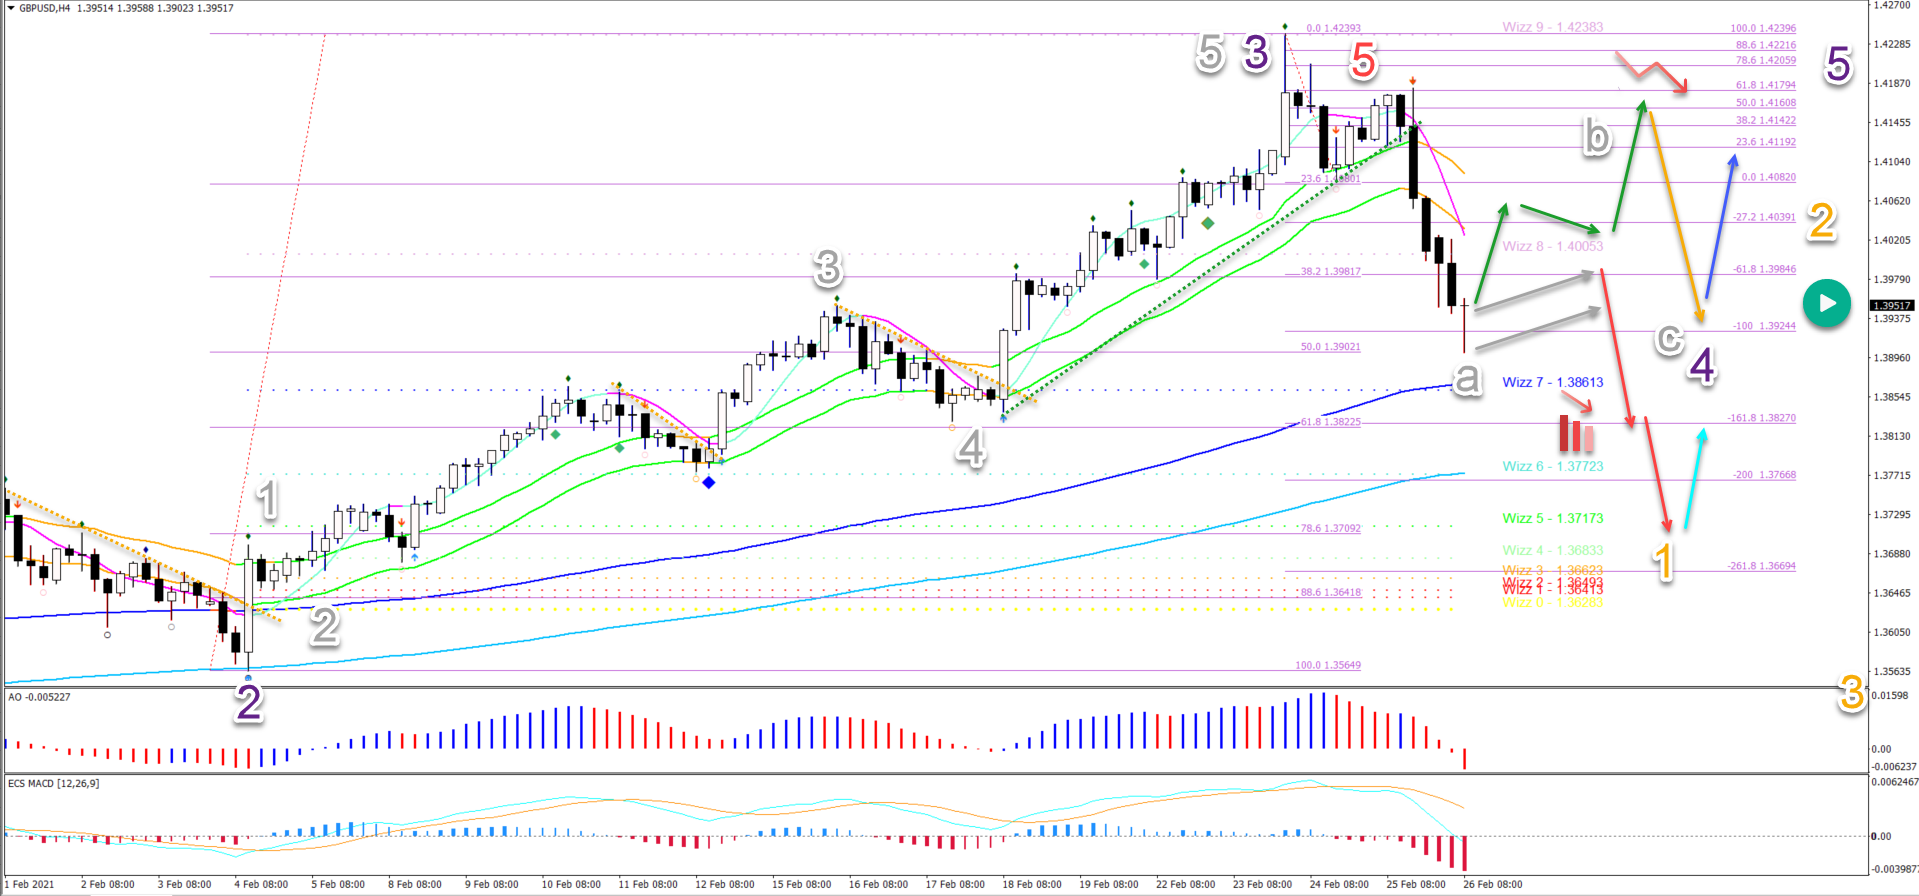 GBP/USD 26.02.2021 4 hour chart